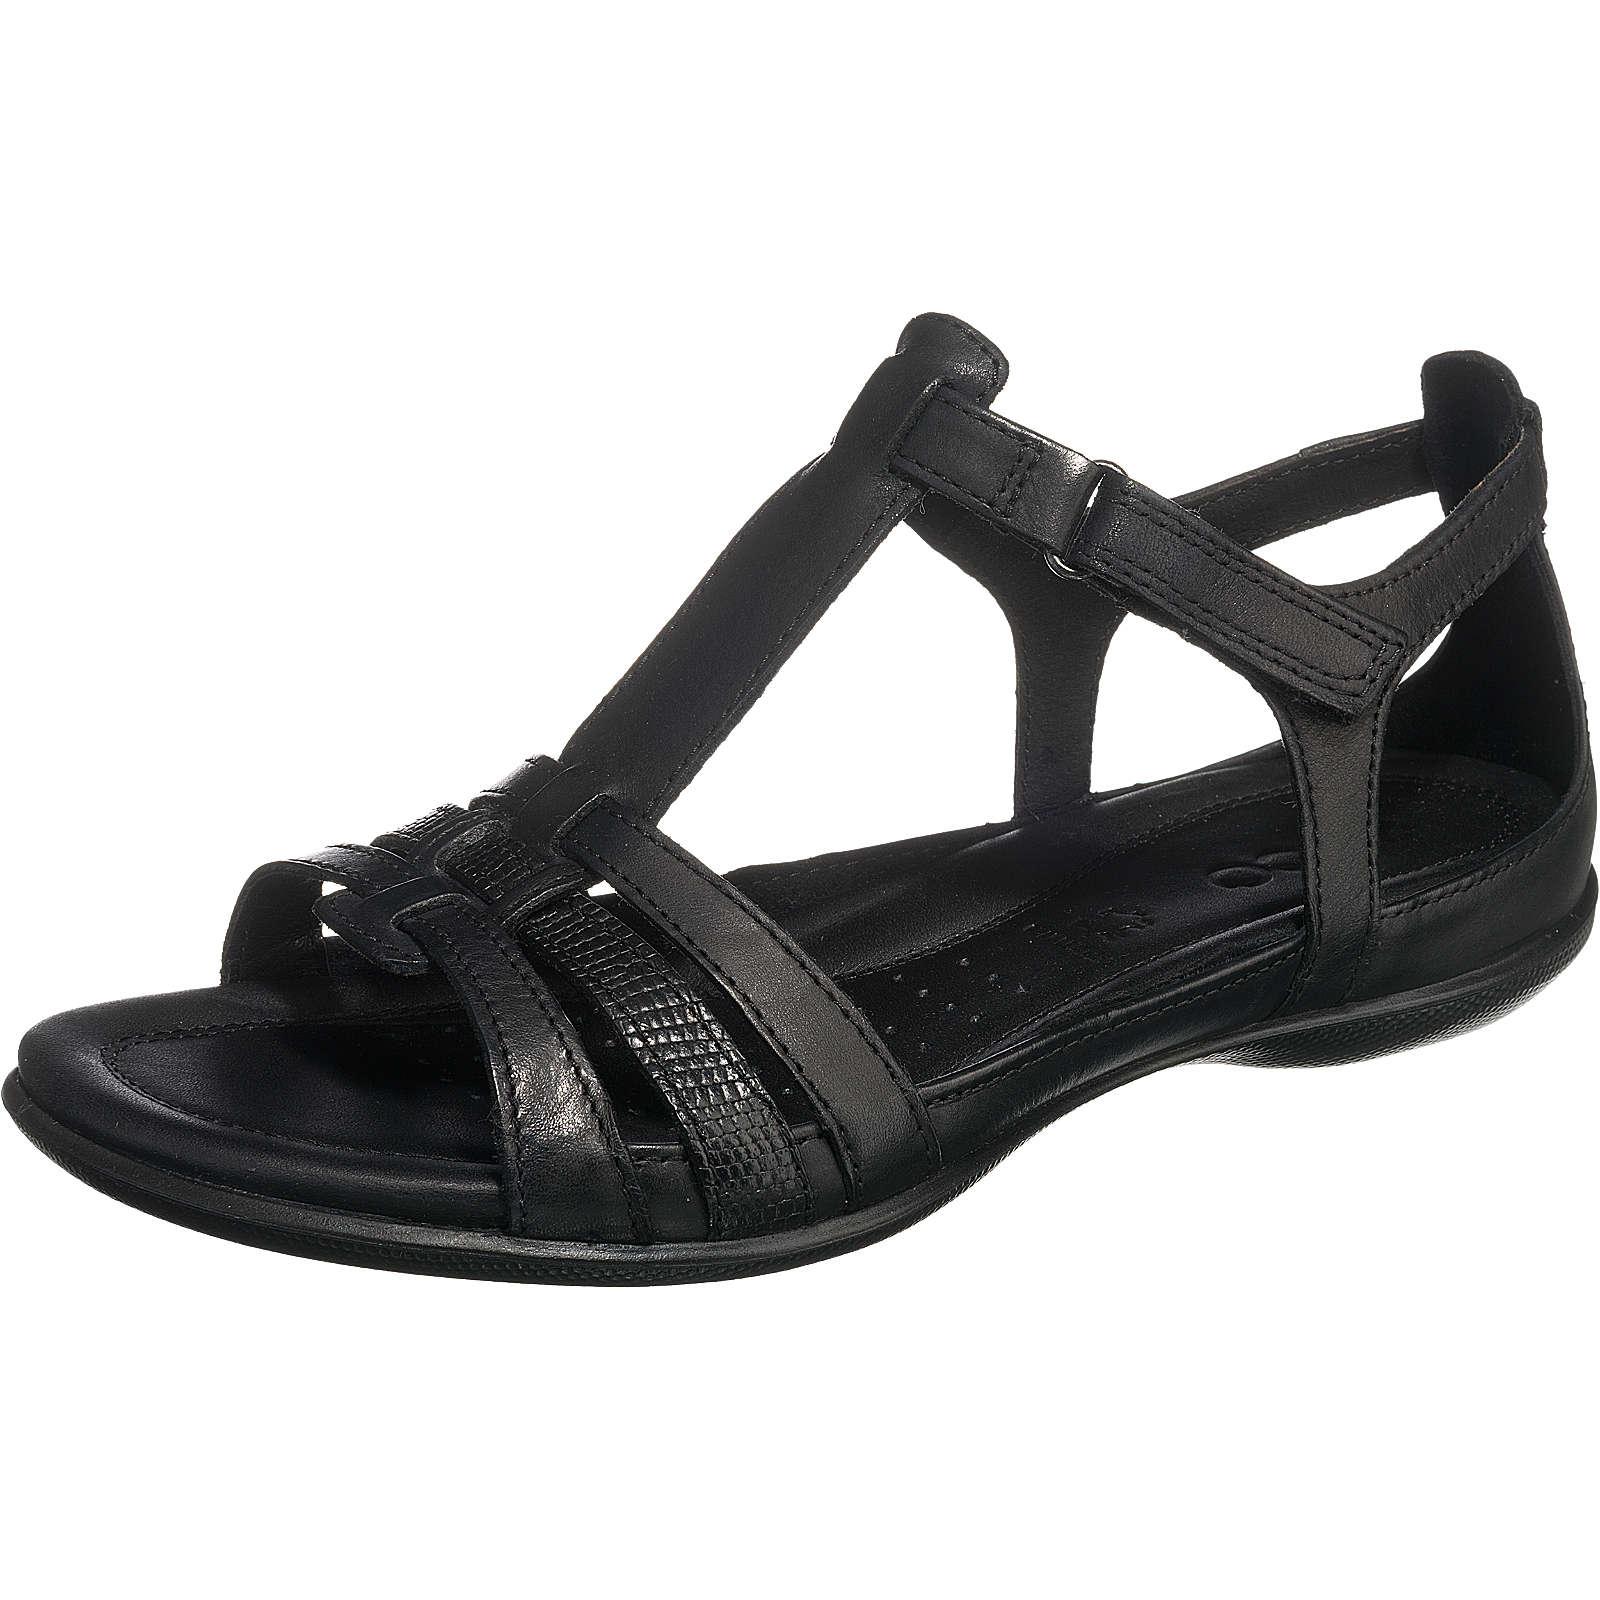 ecco Flash Black/Black Sambal/Leila T-Steg-Sandalen schwarz Damen Gr. 40